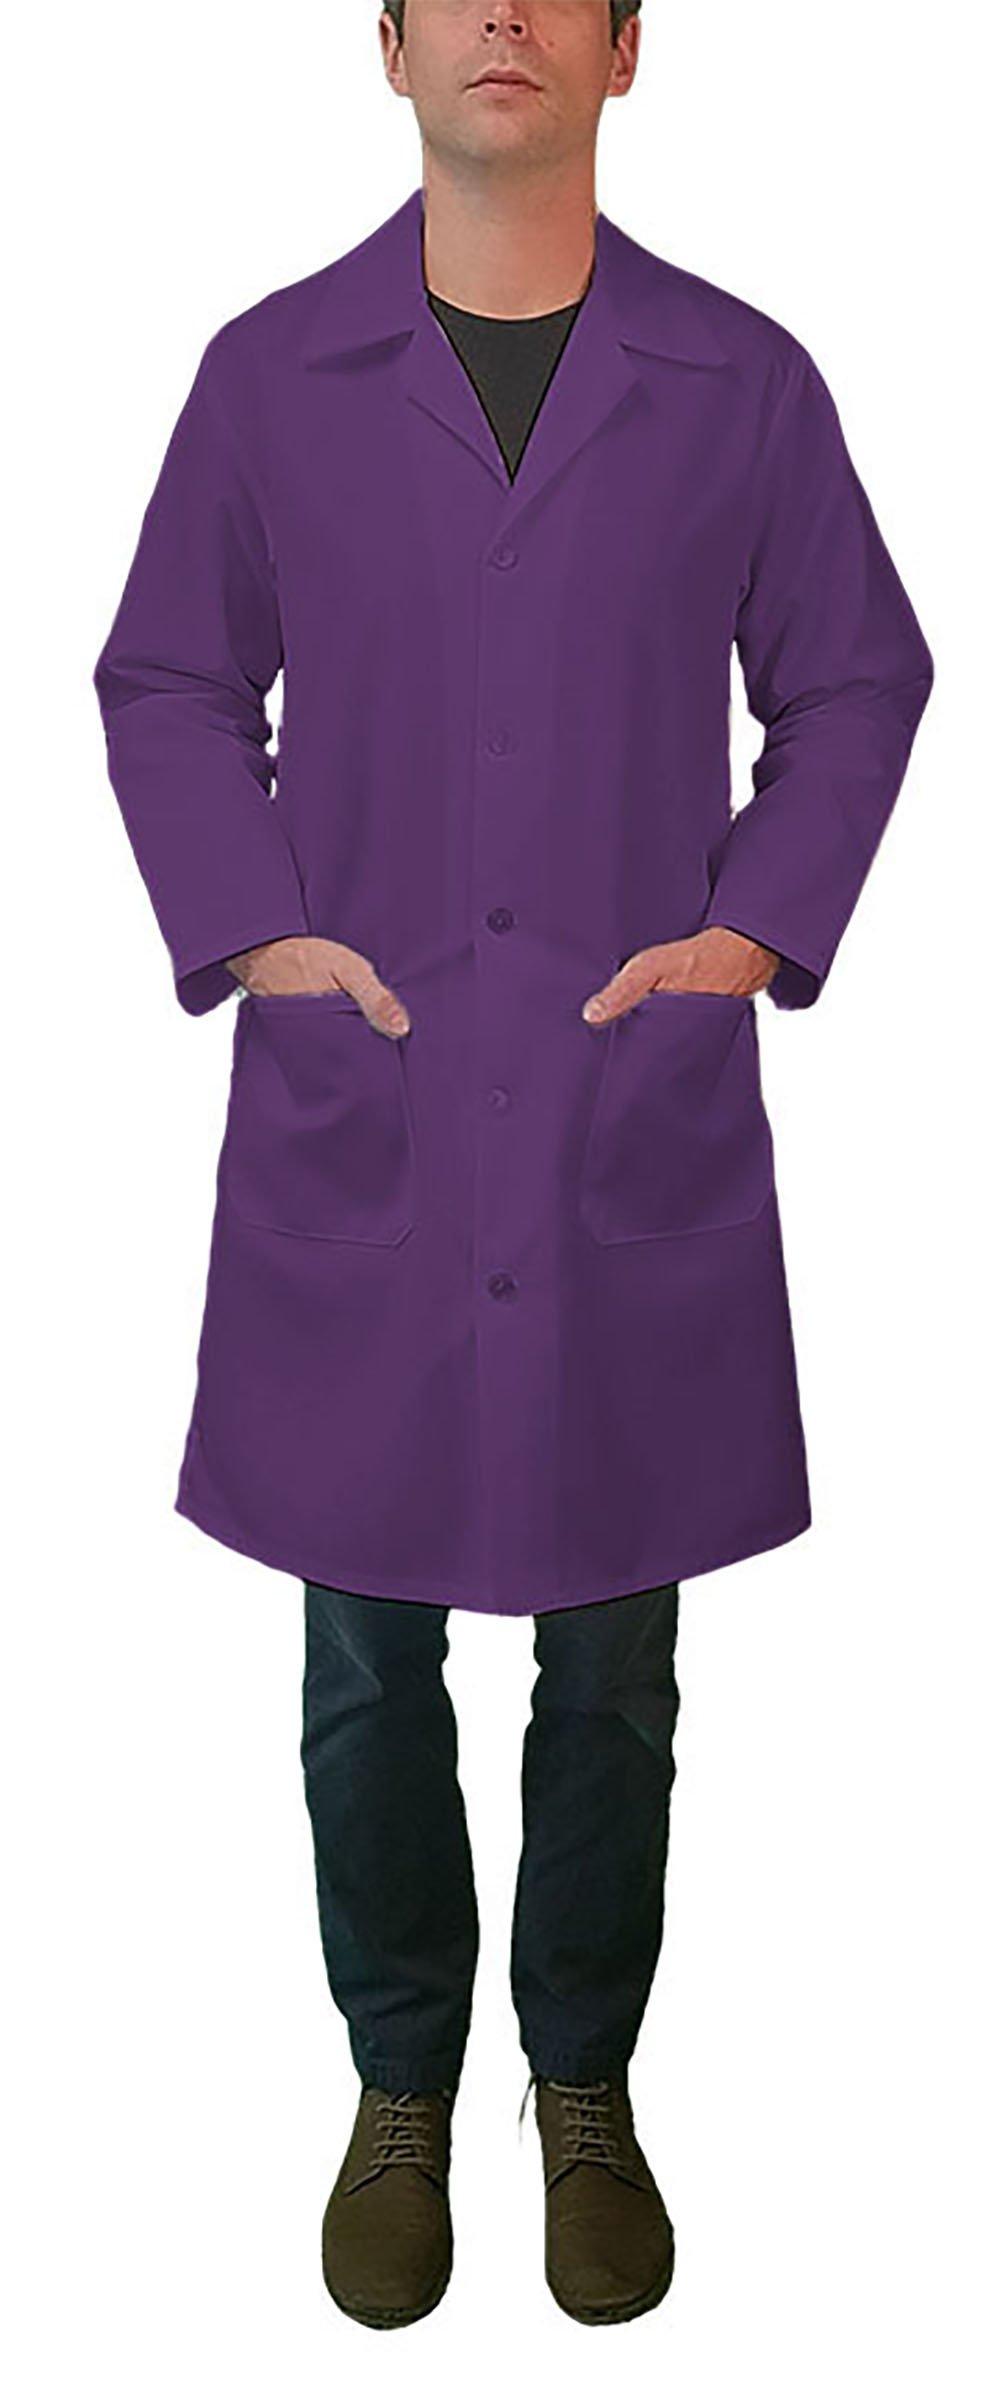 Linens USA Lab Coat